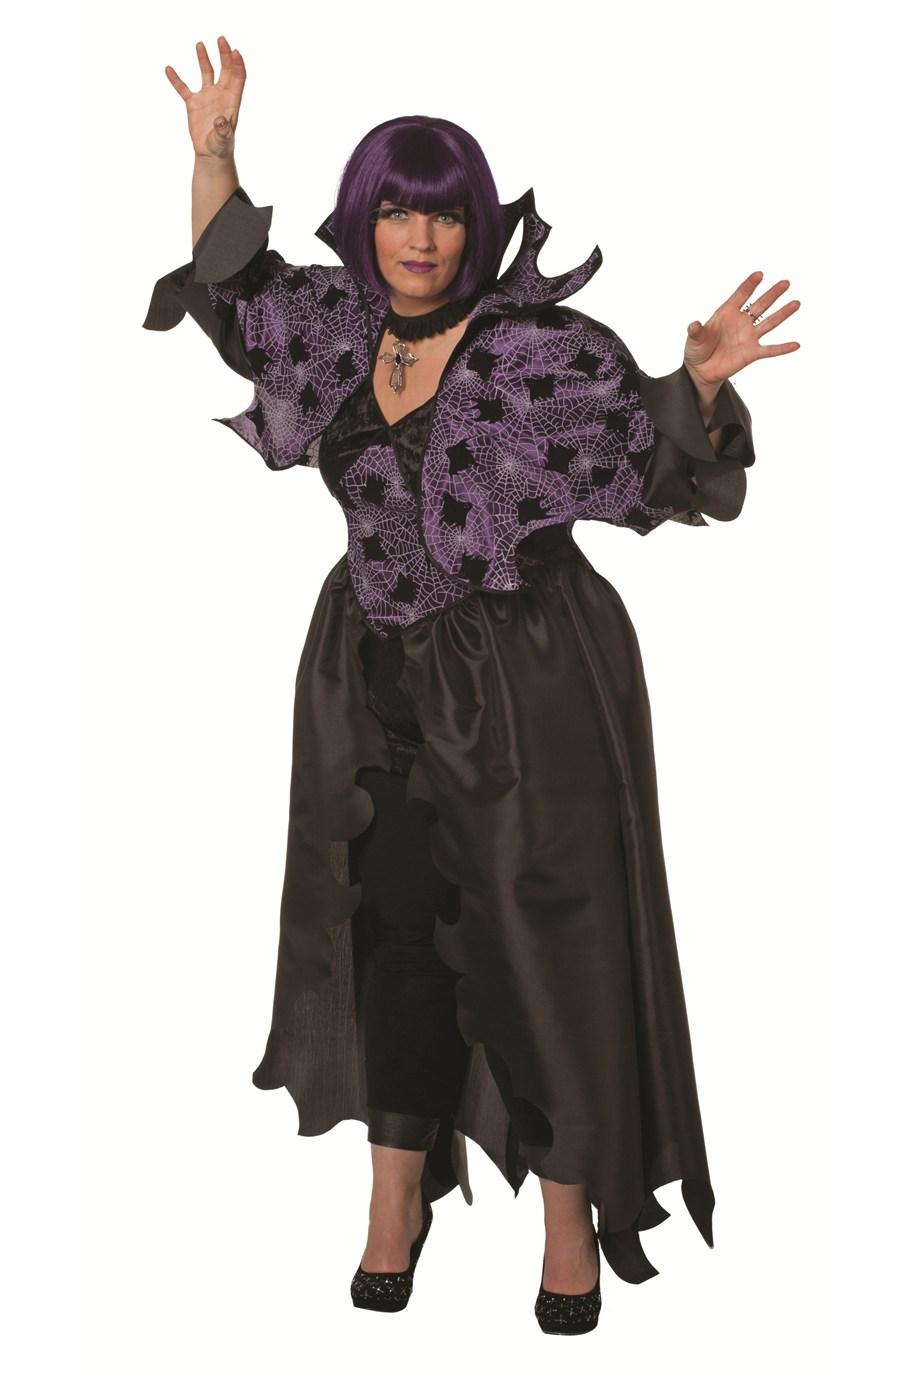 XXL Daemonen Lady Faschingskostuem grosse Groesse Halloweenverkleidung Oversized 452